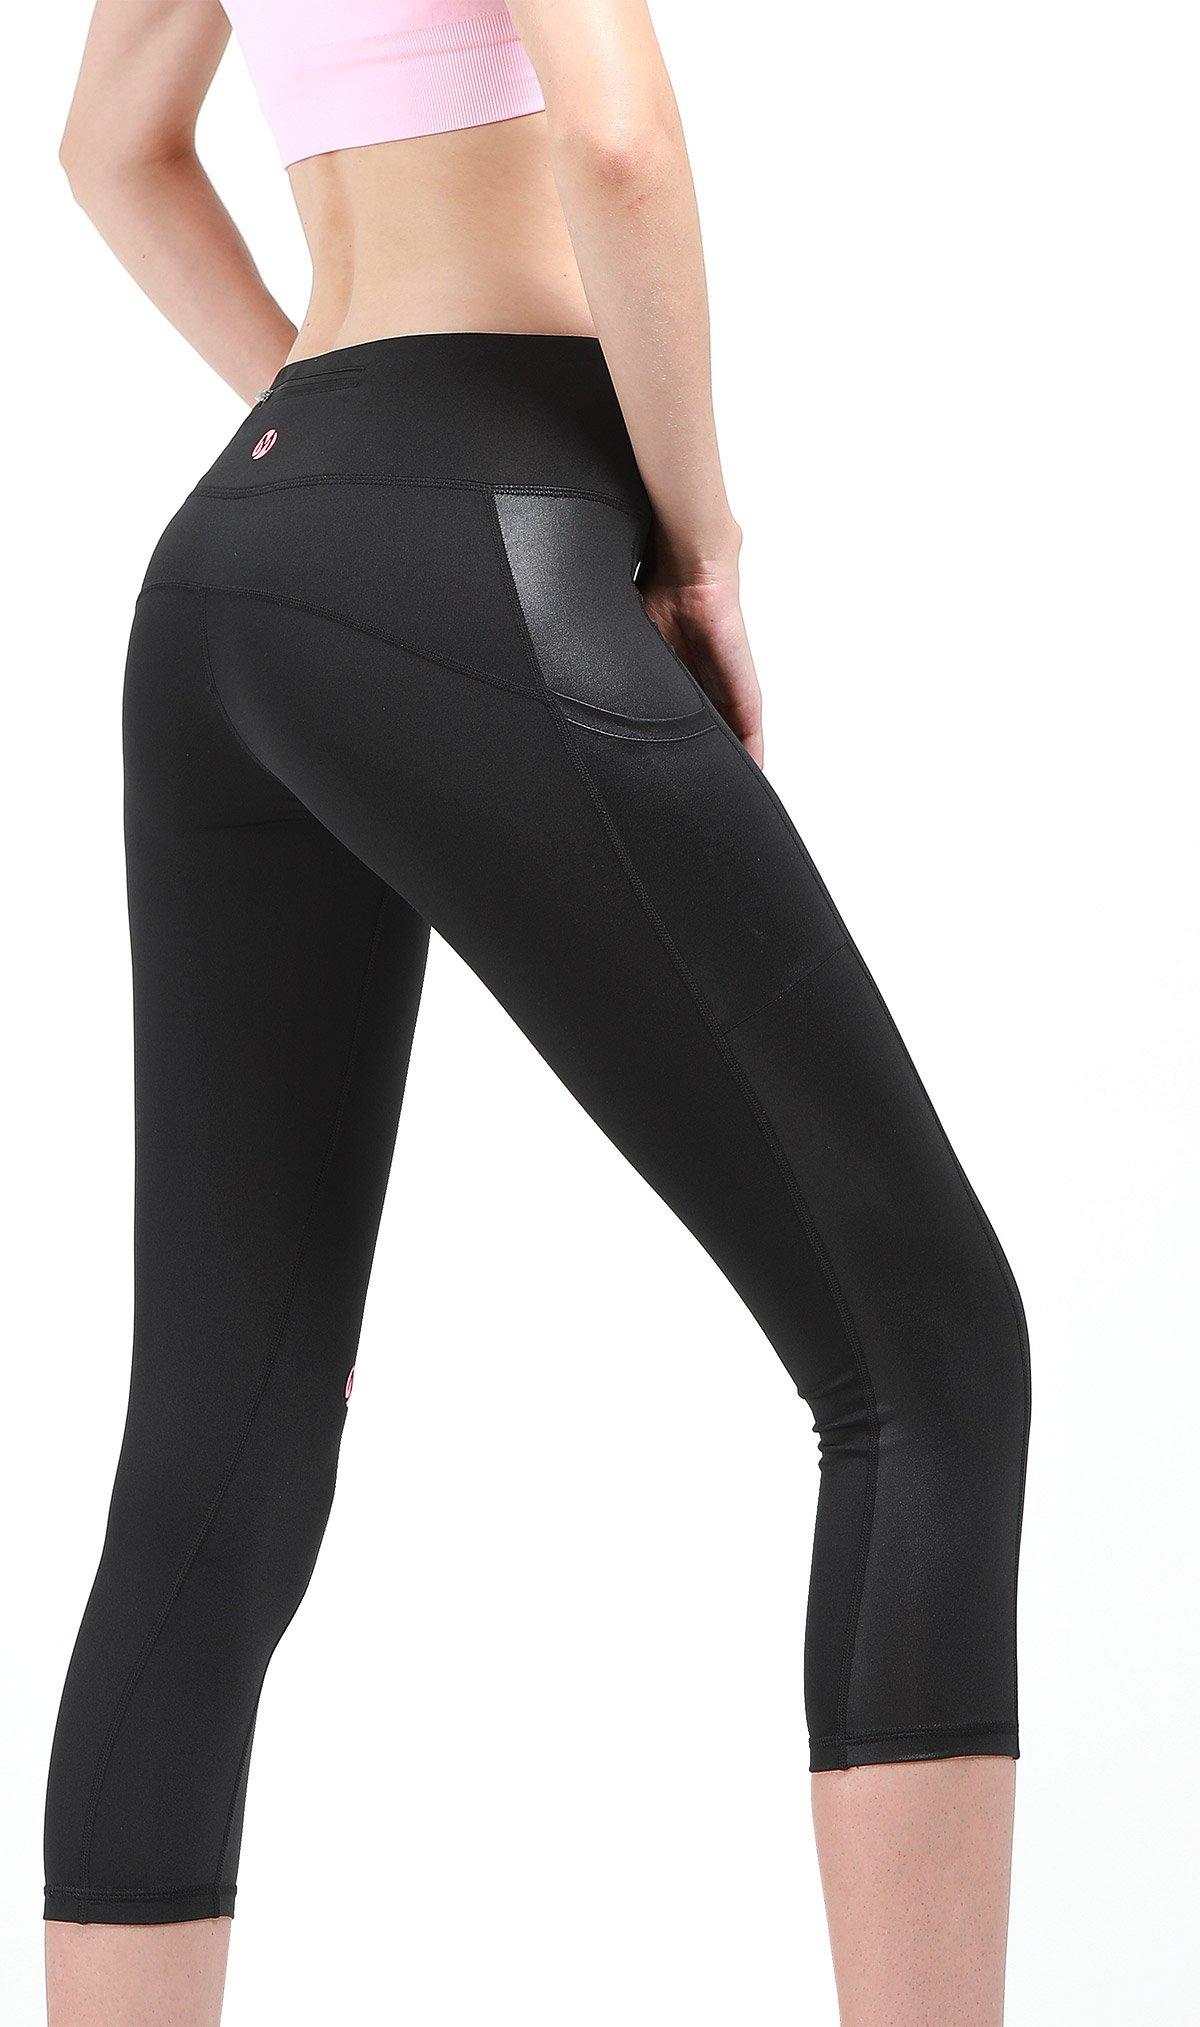 Myoga Women S Yoga Pants Workout Leggings Running Tights